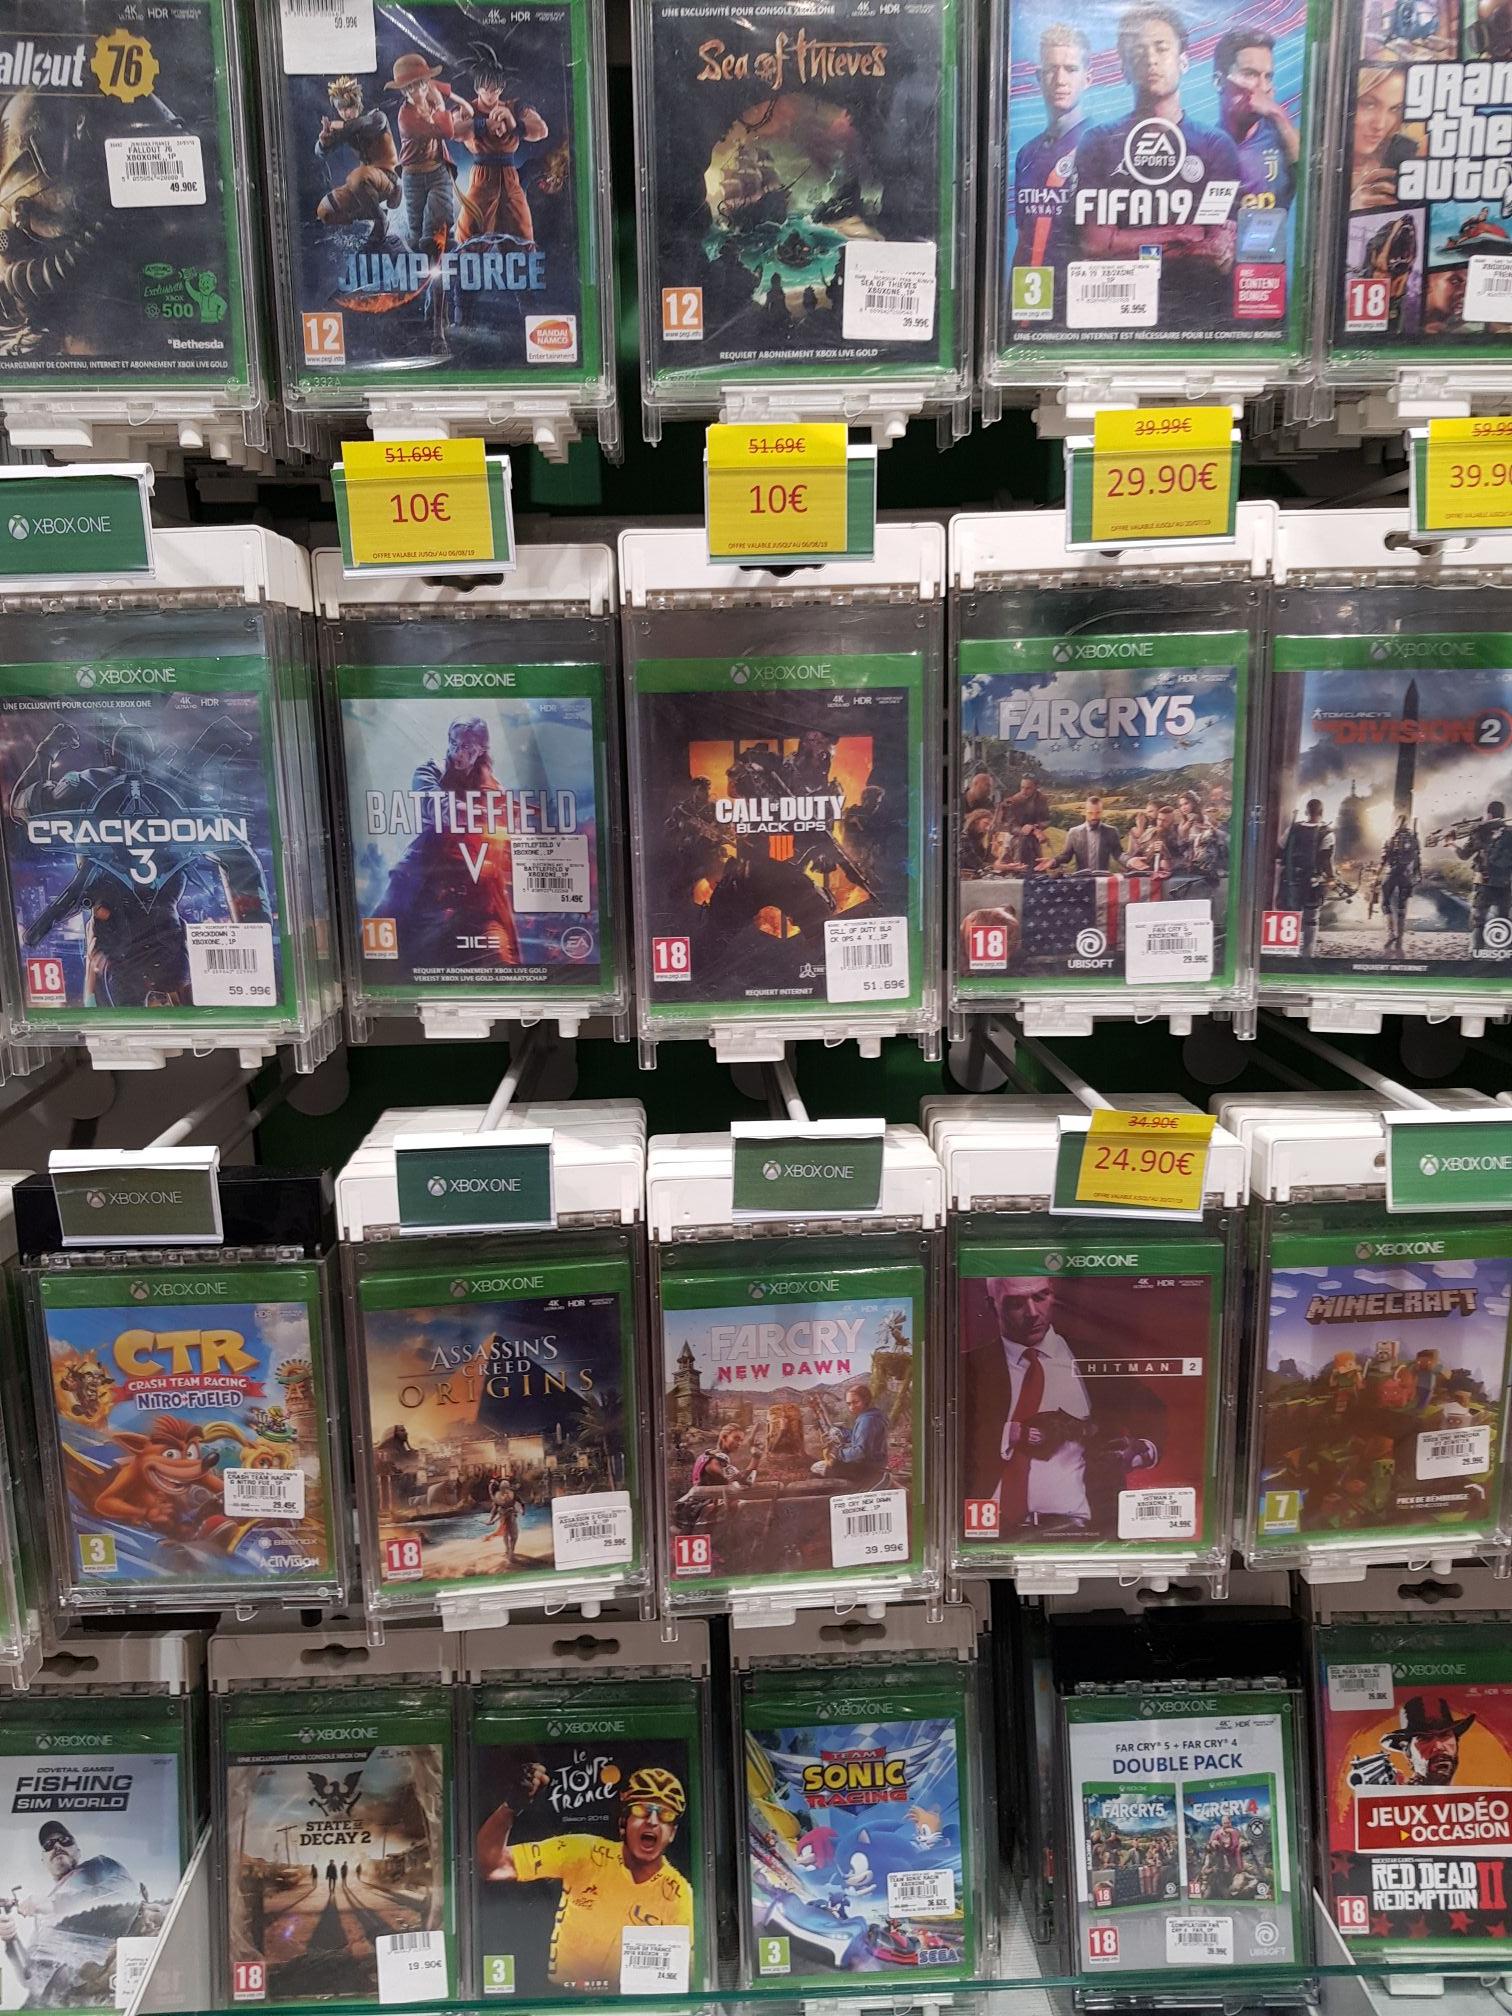 Jeu Battlefield V sur Xbox One - Pornic (44)